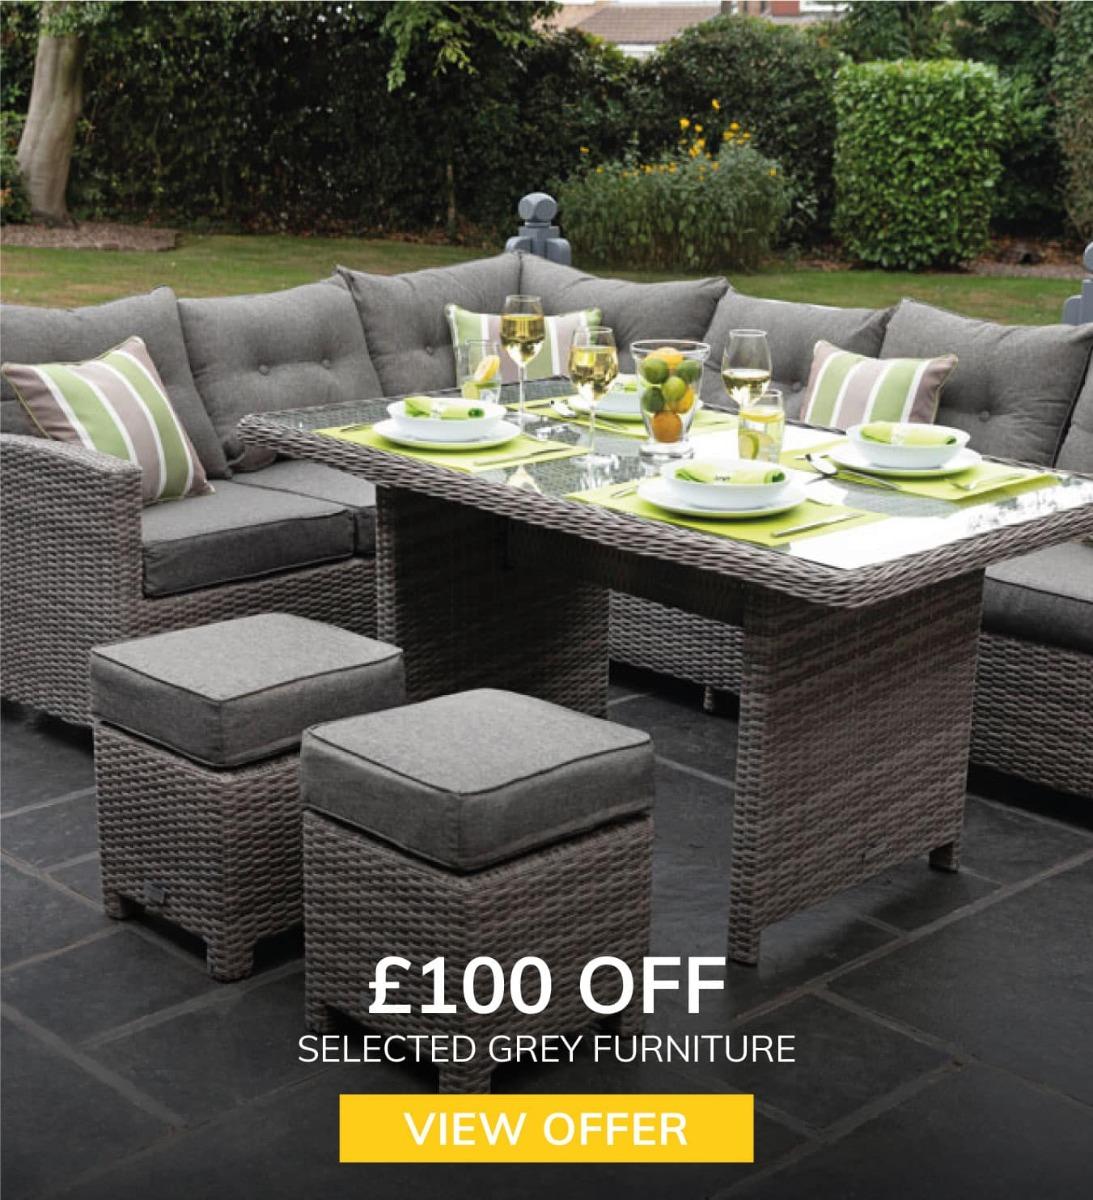 60b247c1aa8b Rattan Furniture Shop UK - Buy Online from Rattan Direct   Rattan Direct